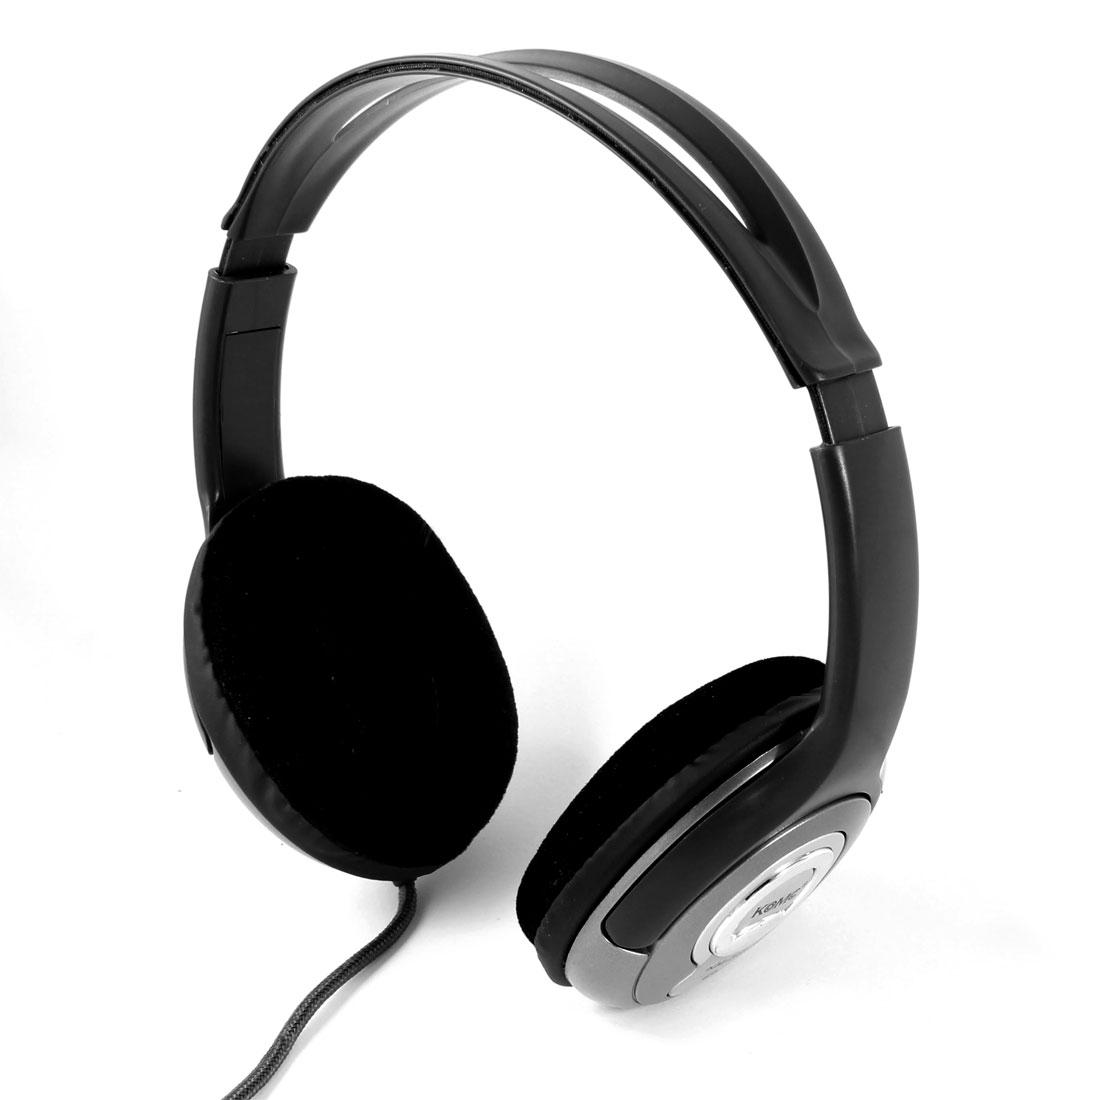 Gray Wide Headband PC Computer Headphone Headset 3.5mm Jack w Microphone